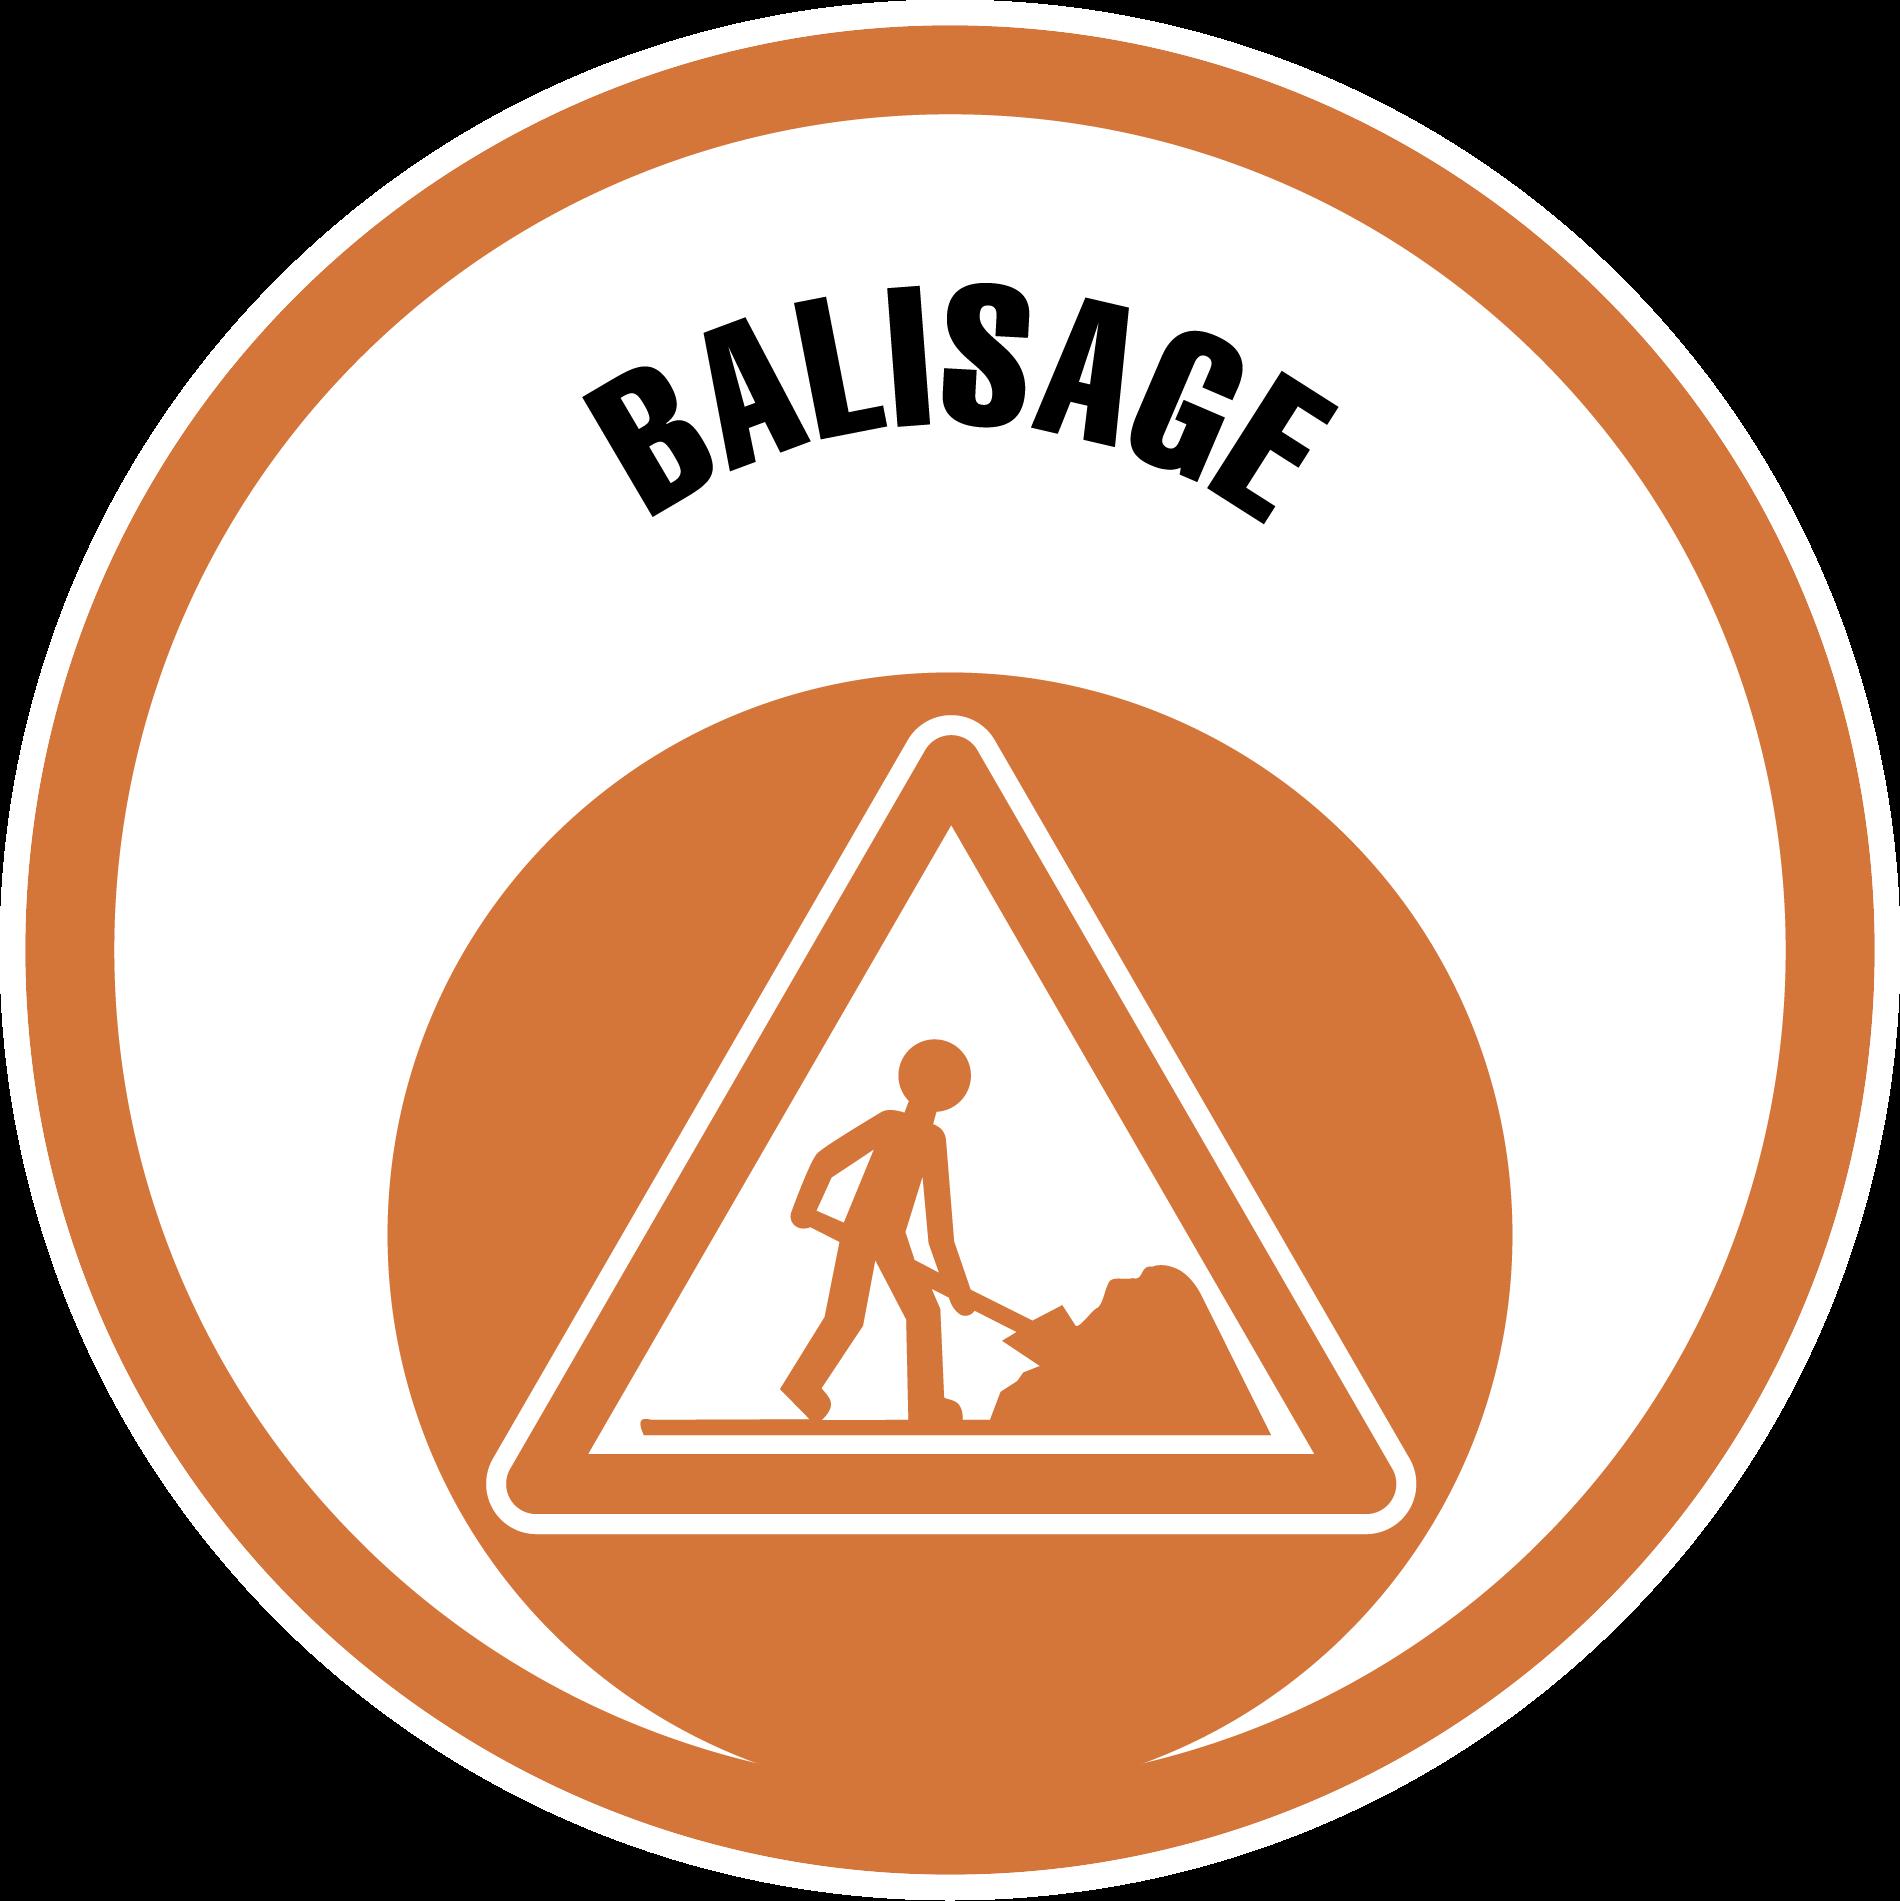 Logo formation Balisage